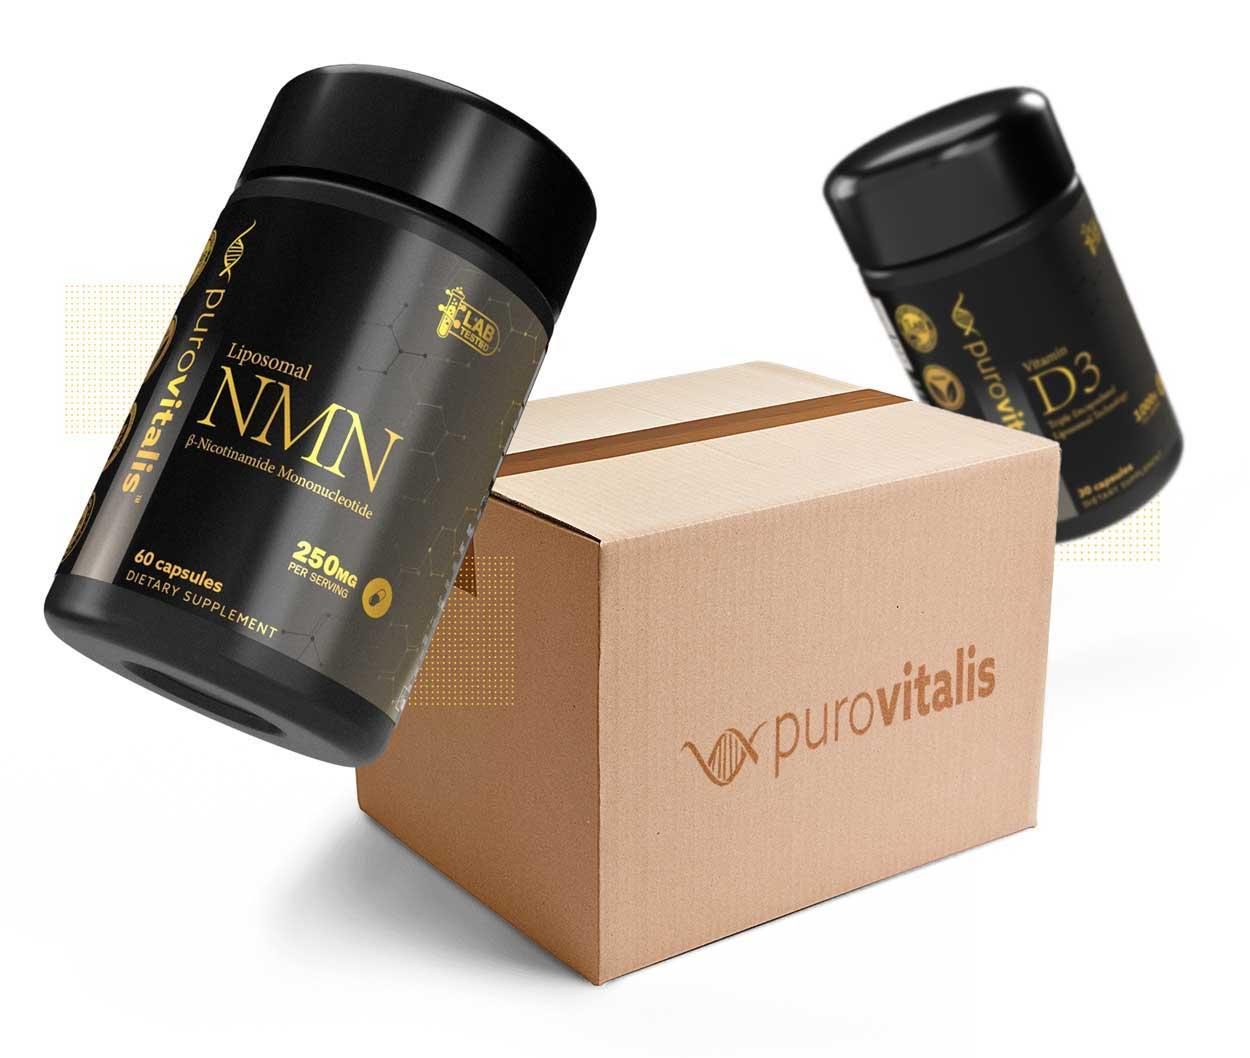 Shipping box with liposomal nmn capsules